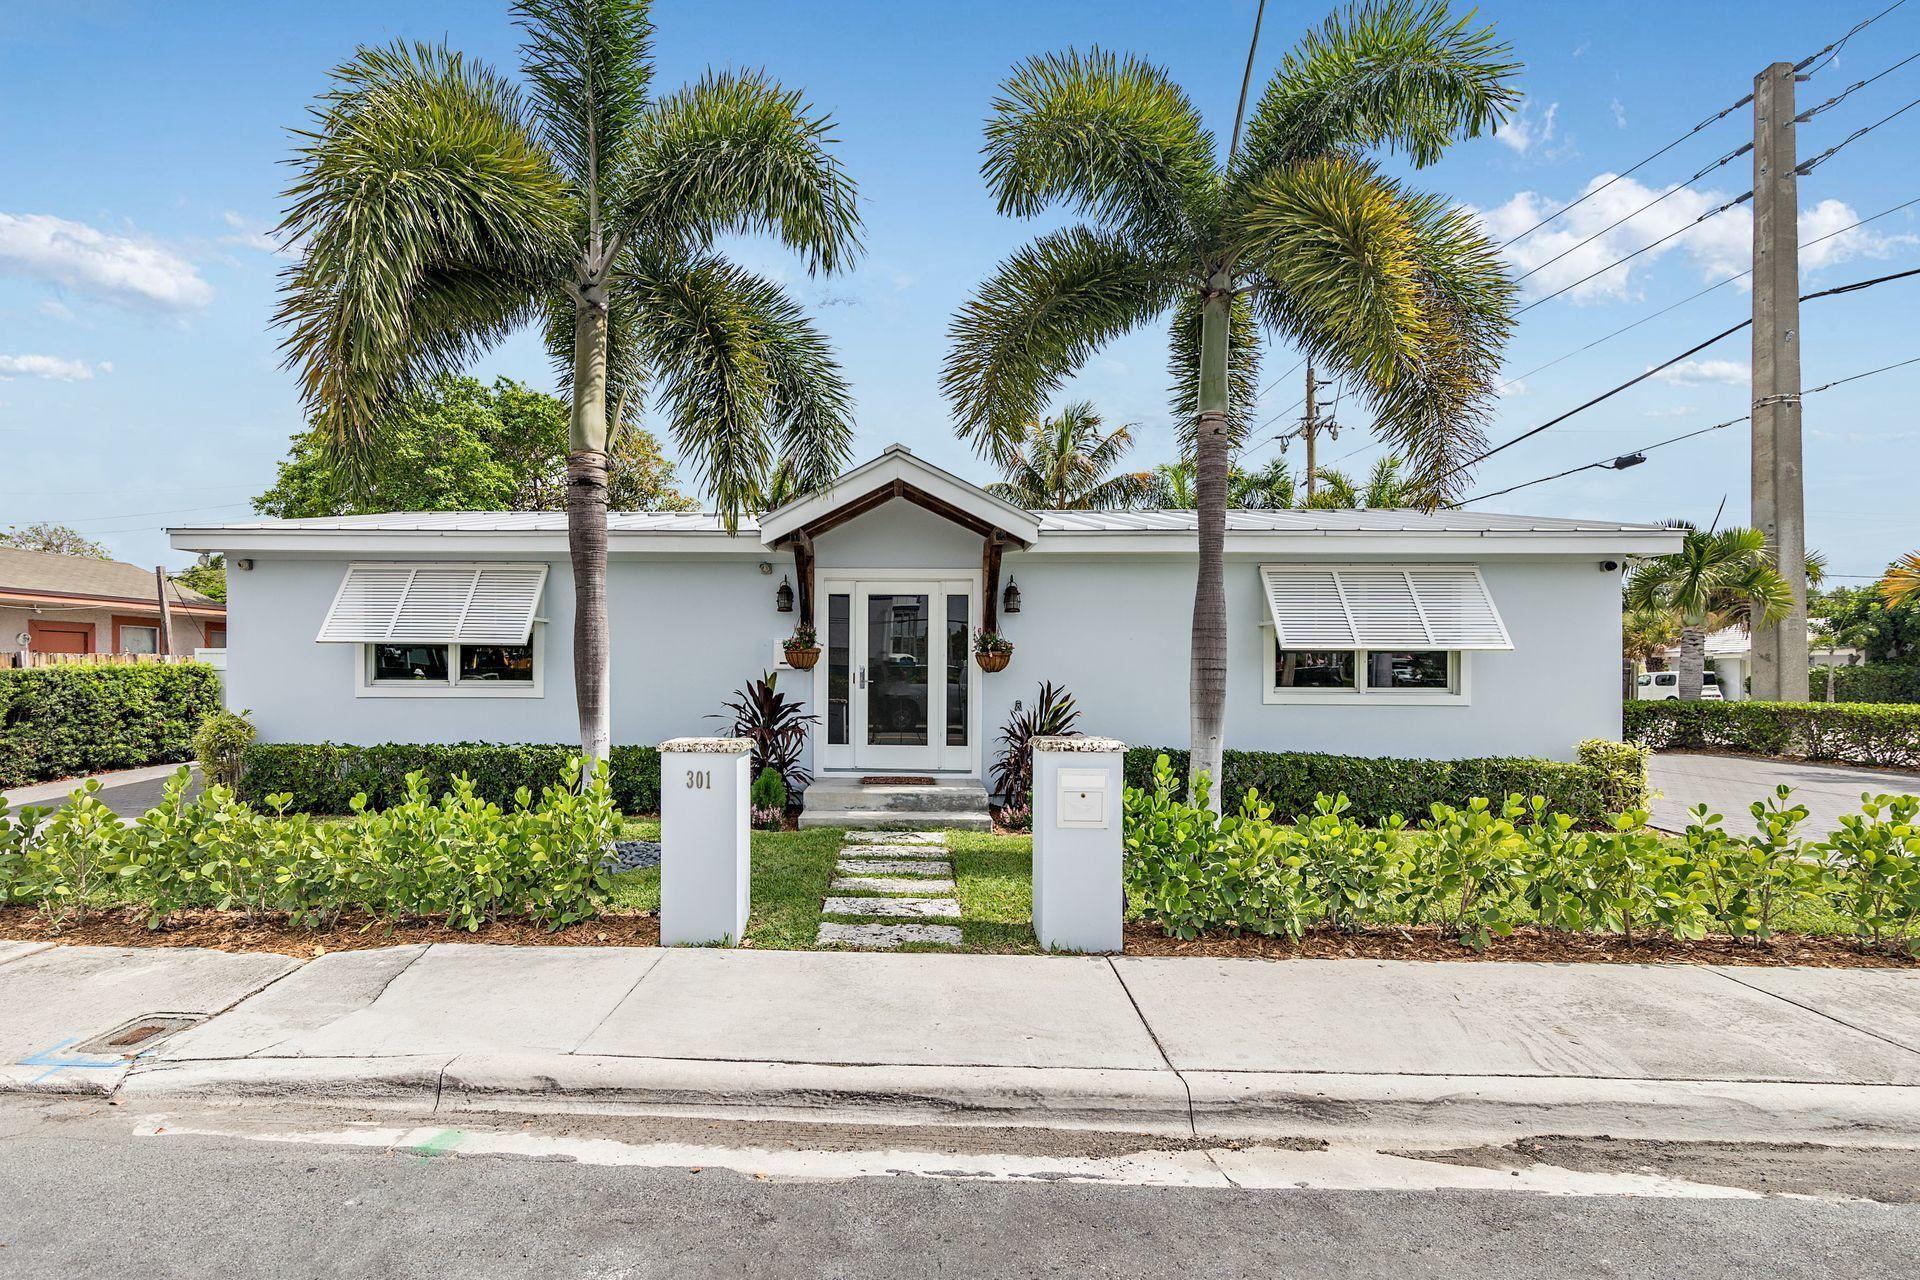 301 Conniston Road, West Palm Beach, FL 33405 - MLS#: RX-10724471